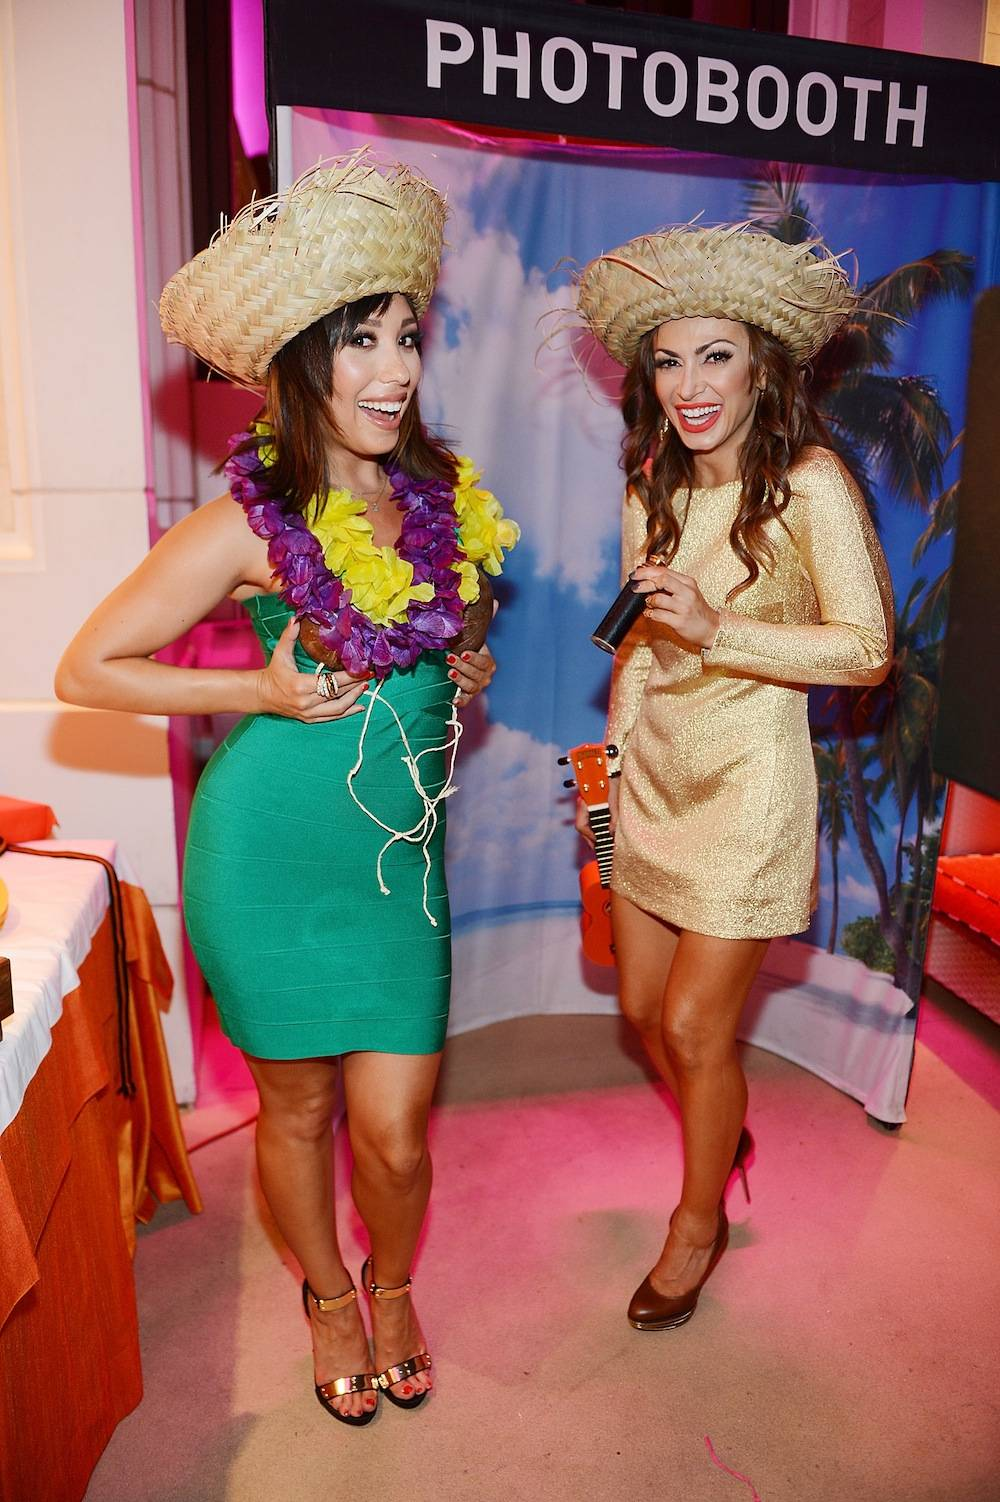 POM Wonderful Debuts Three New 100% Juice Blends With Cheryl Burke & Karina Smirnoff At The Encore Beach Club At Wynn Las Vegas